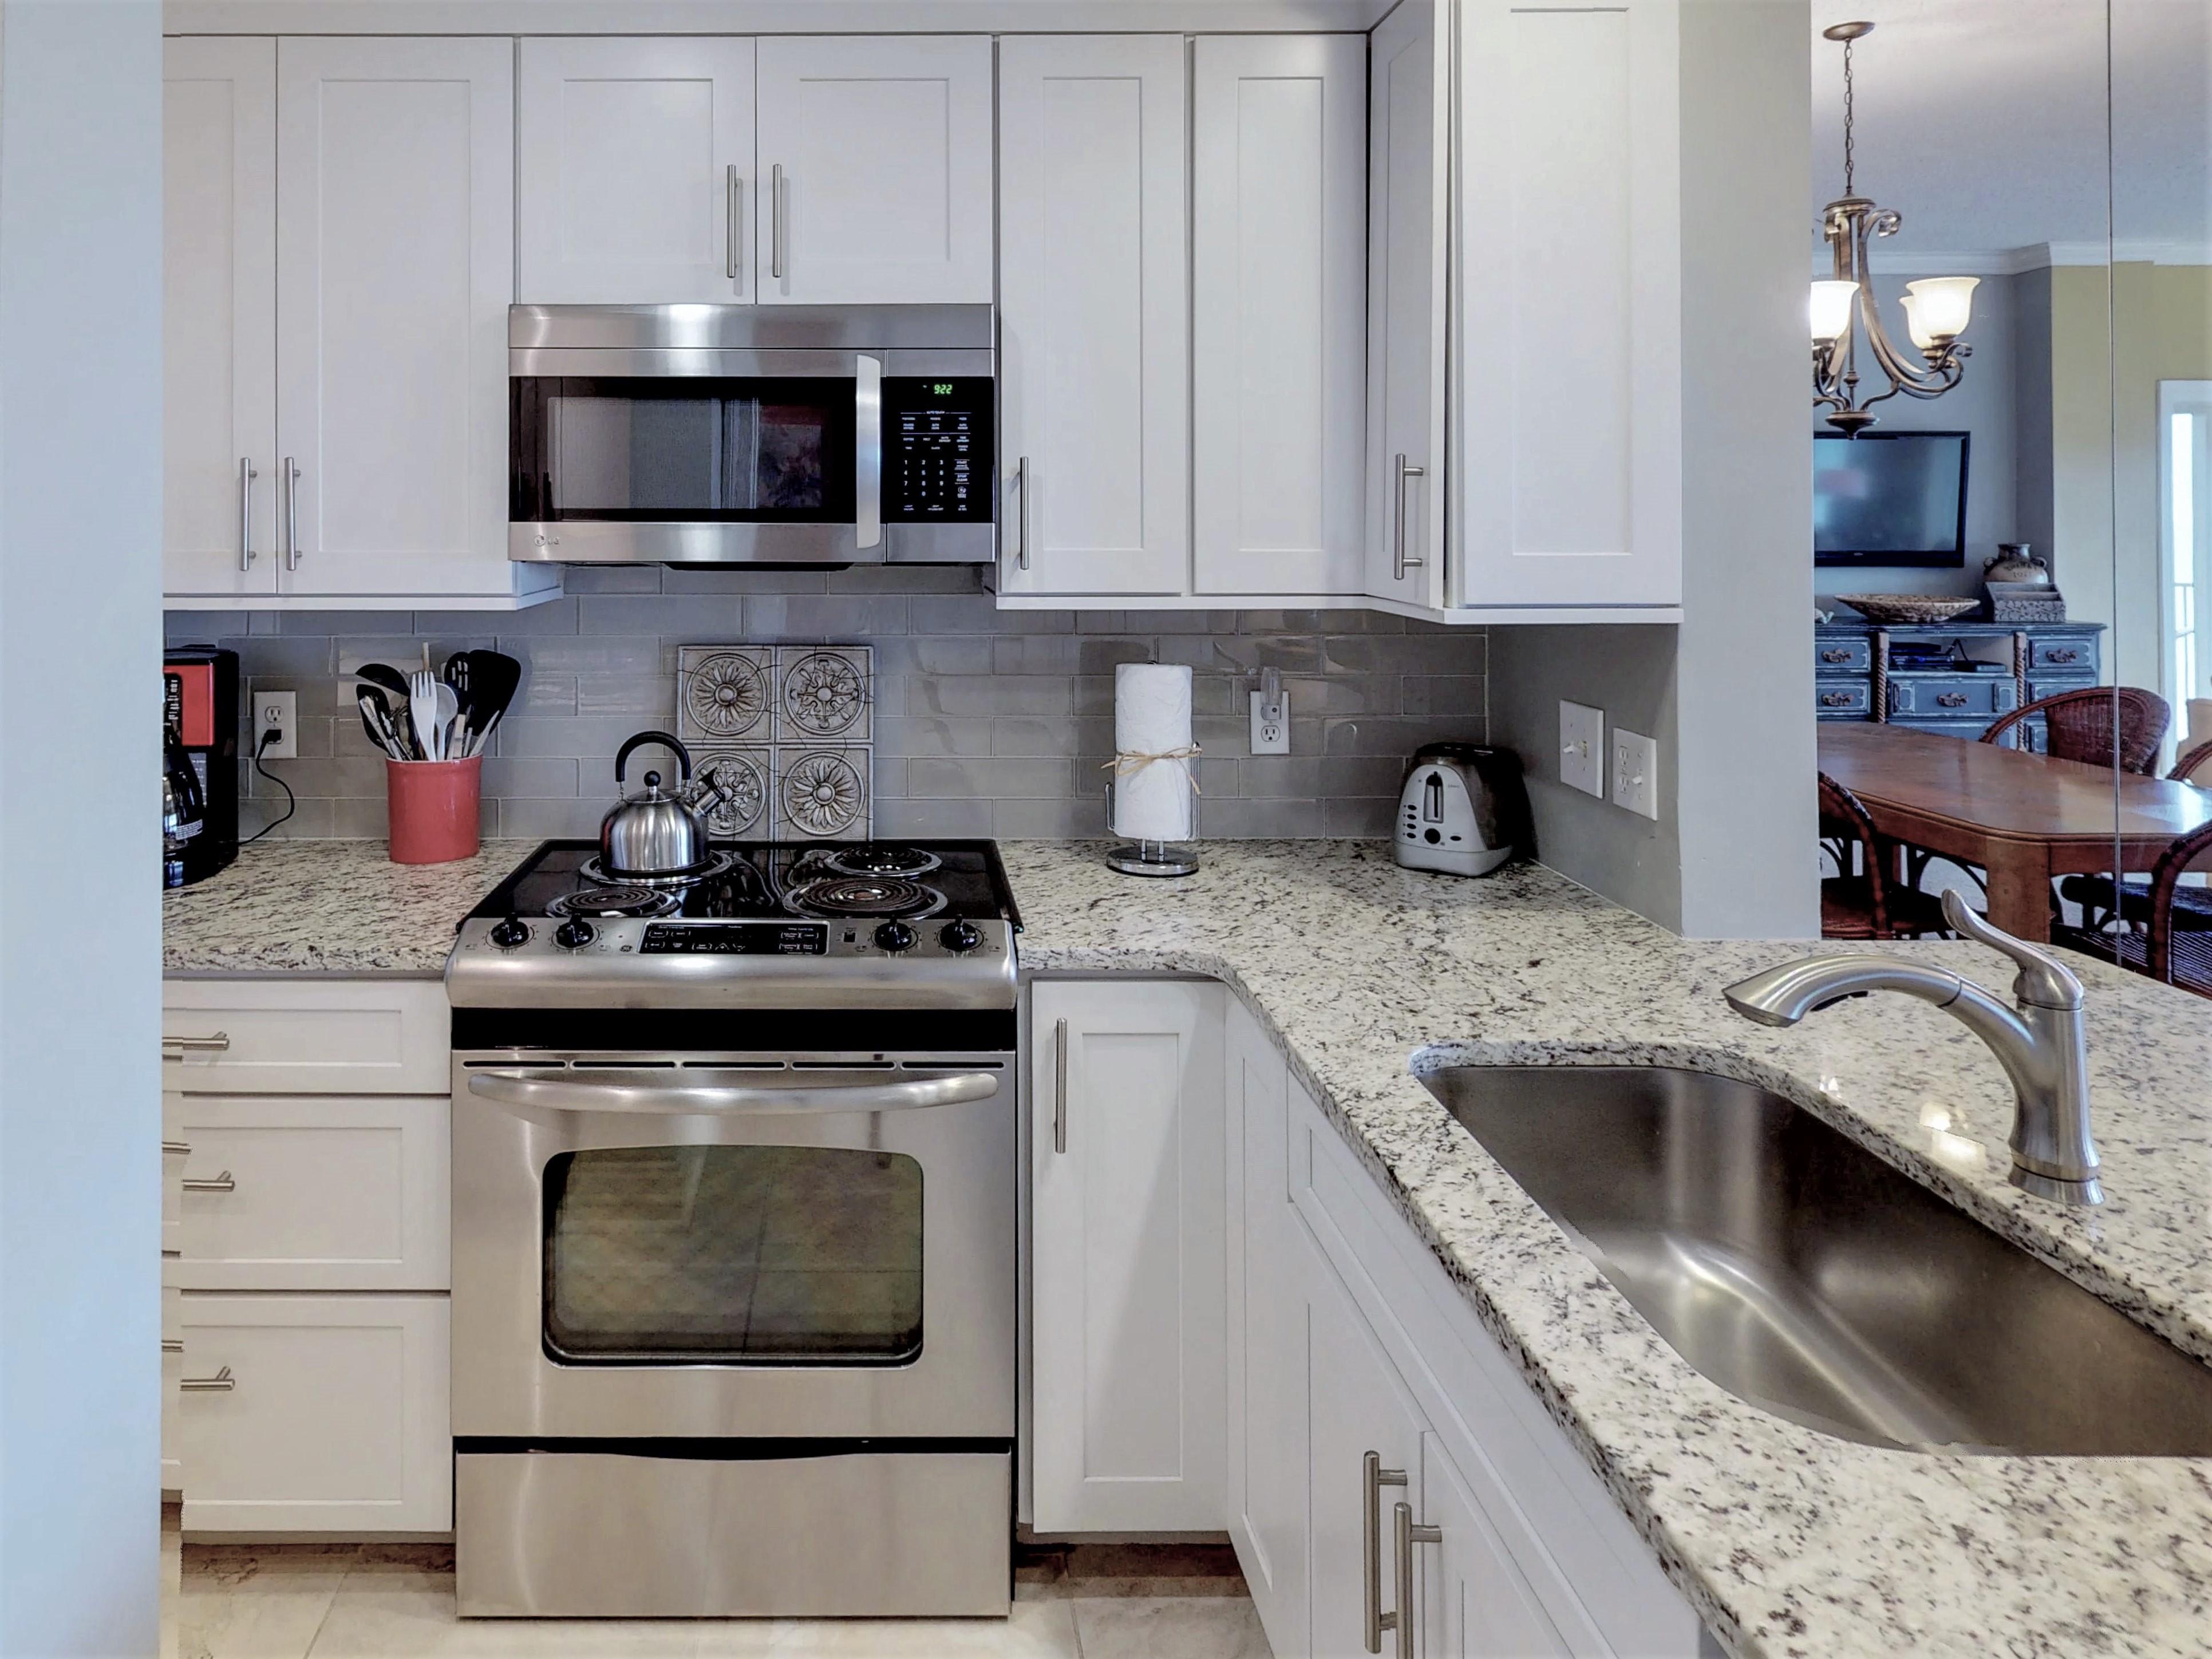 905 Tops'l Beach Manor Condo rental in TOPS'L Beach Manor  in Destin Florida - #7